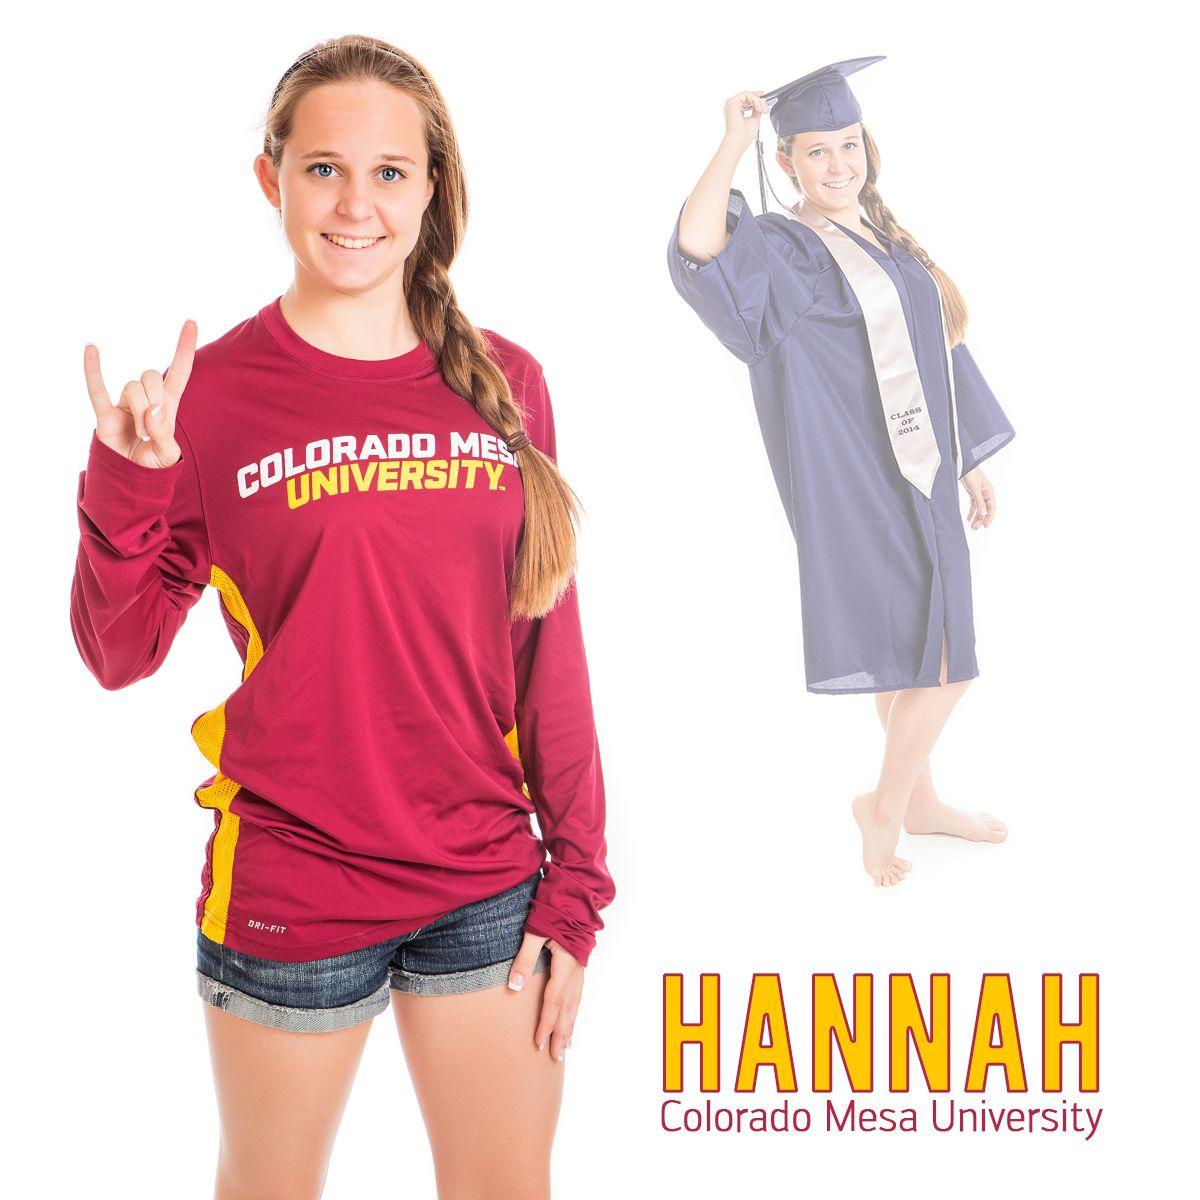 Model Rep, Hannah Mabile, Is Graduating From Lone Star